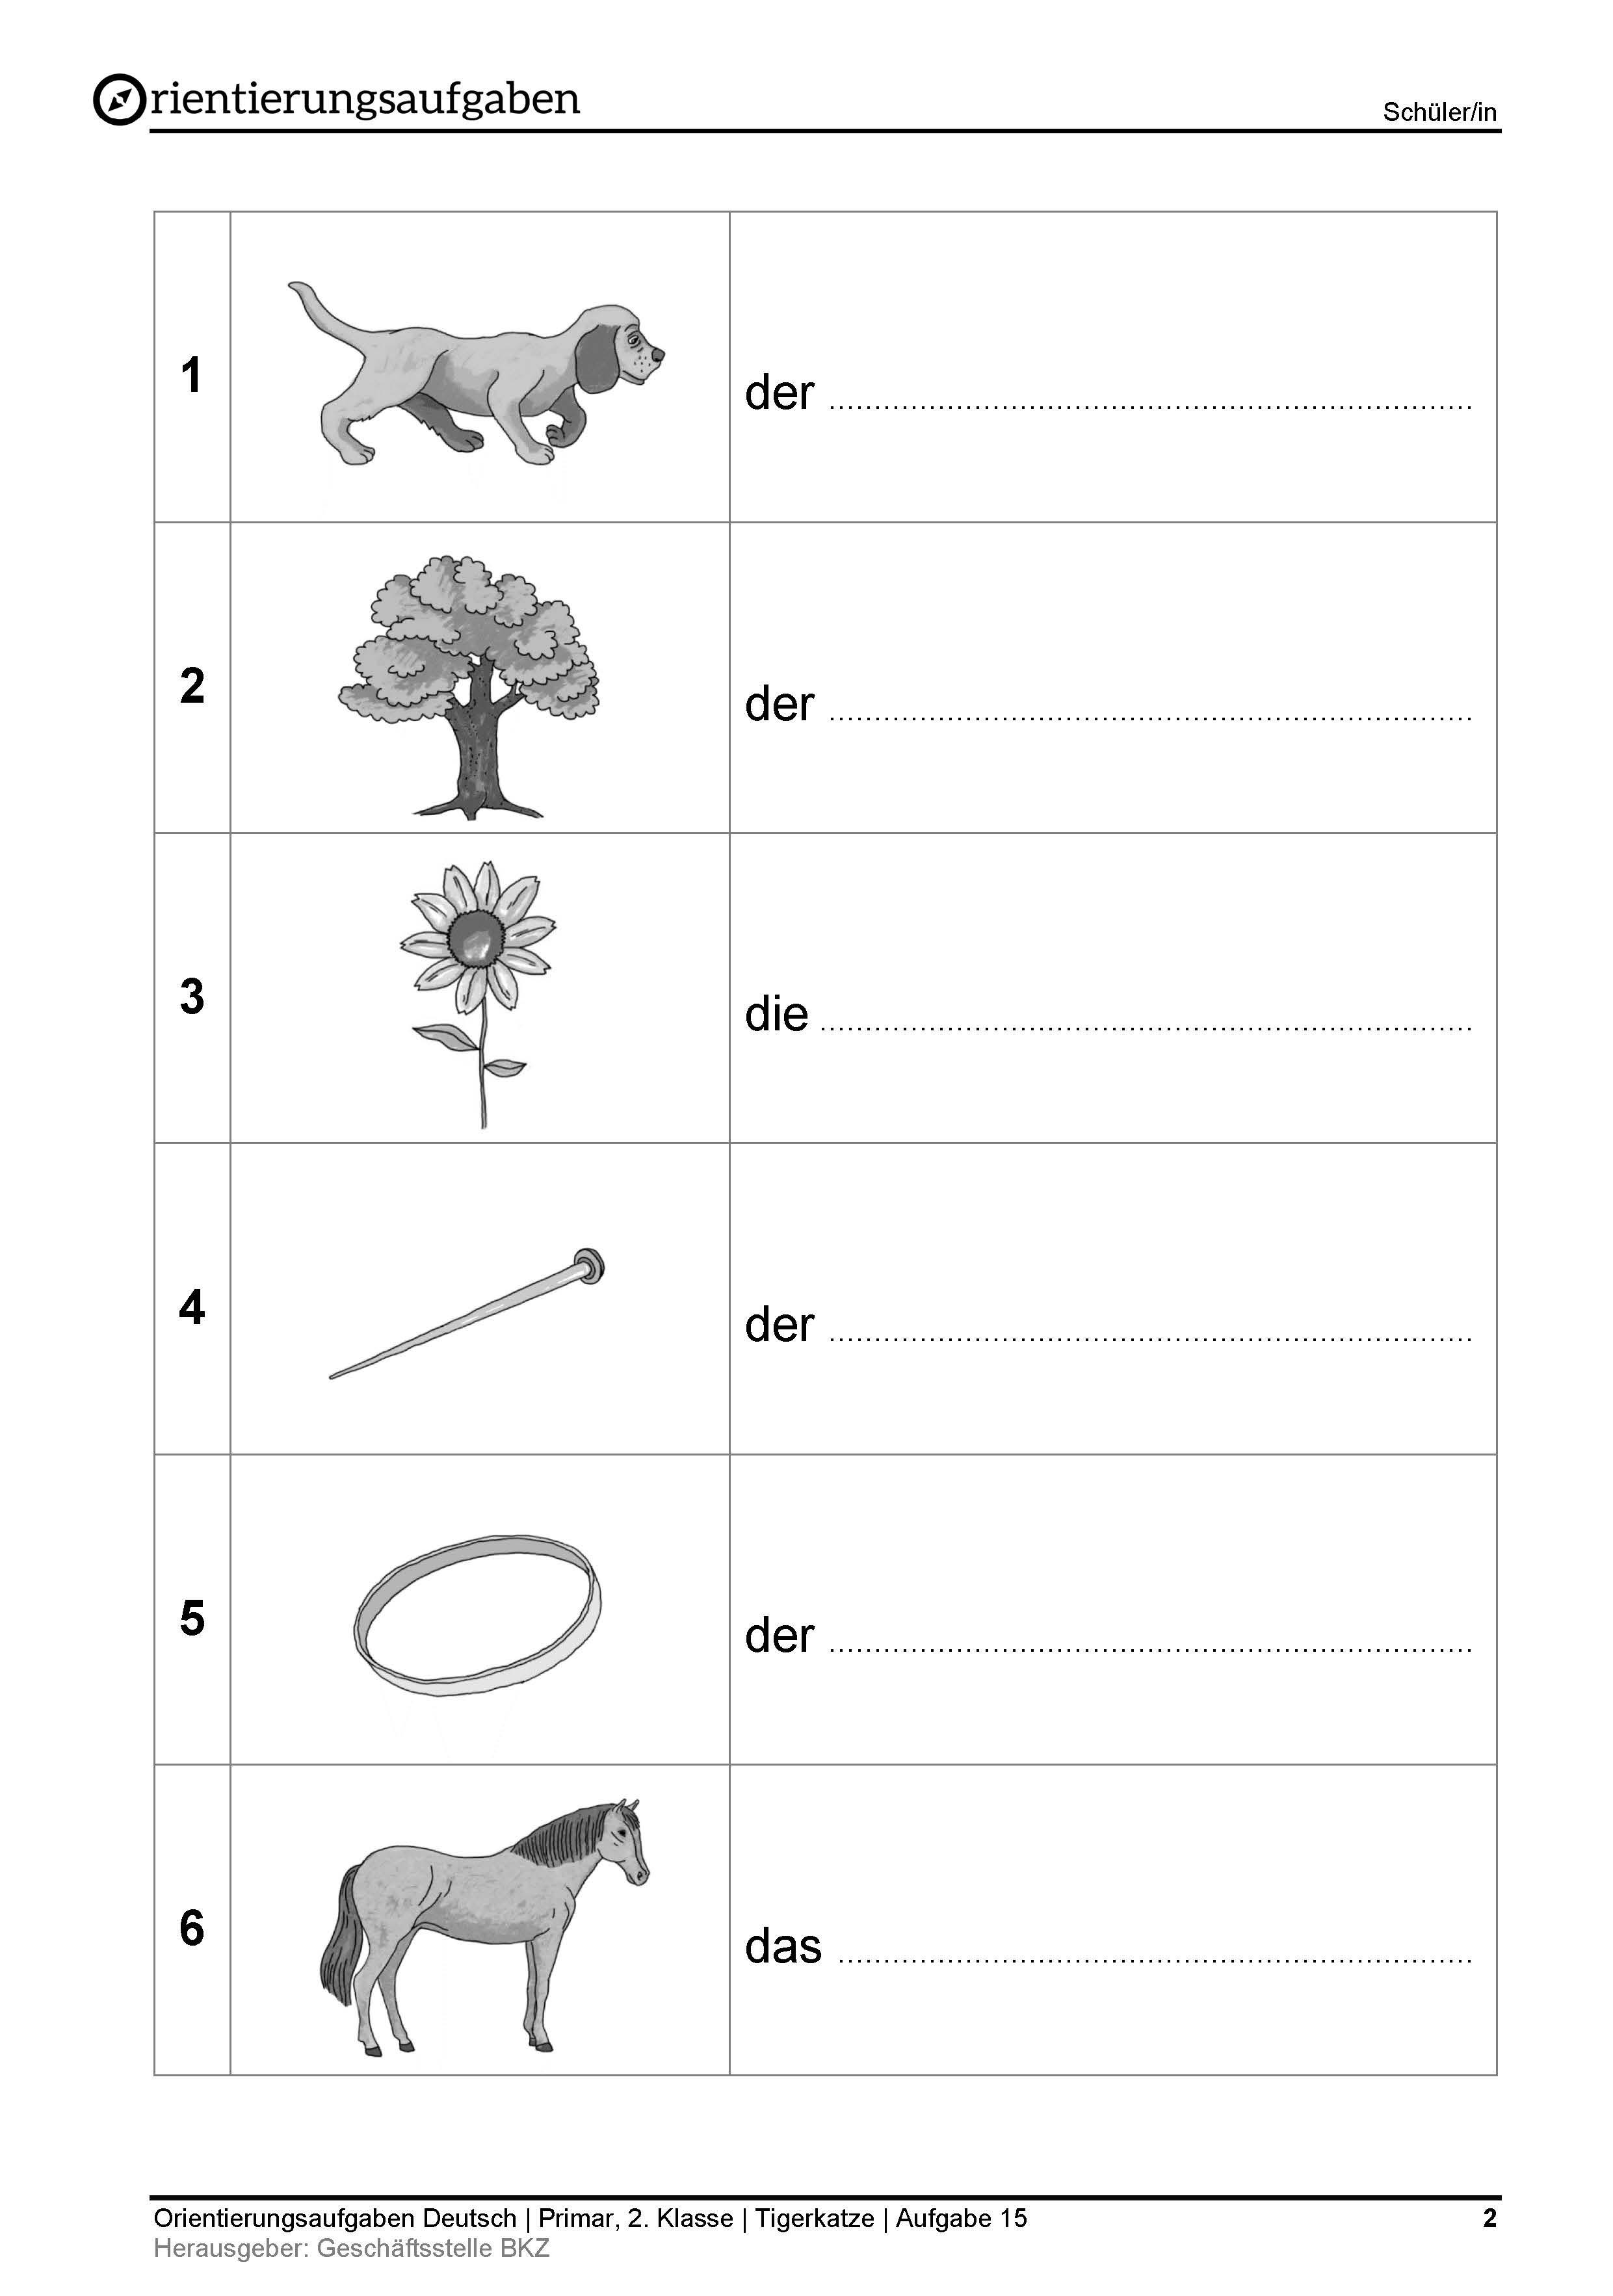 Preview image for LOM object Wörter richtig schreiben